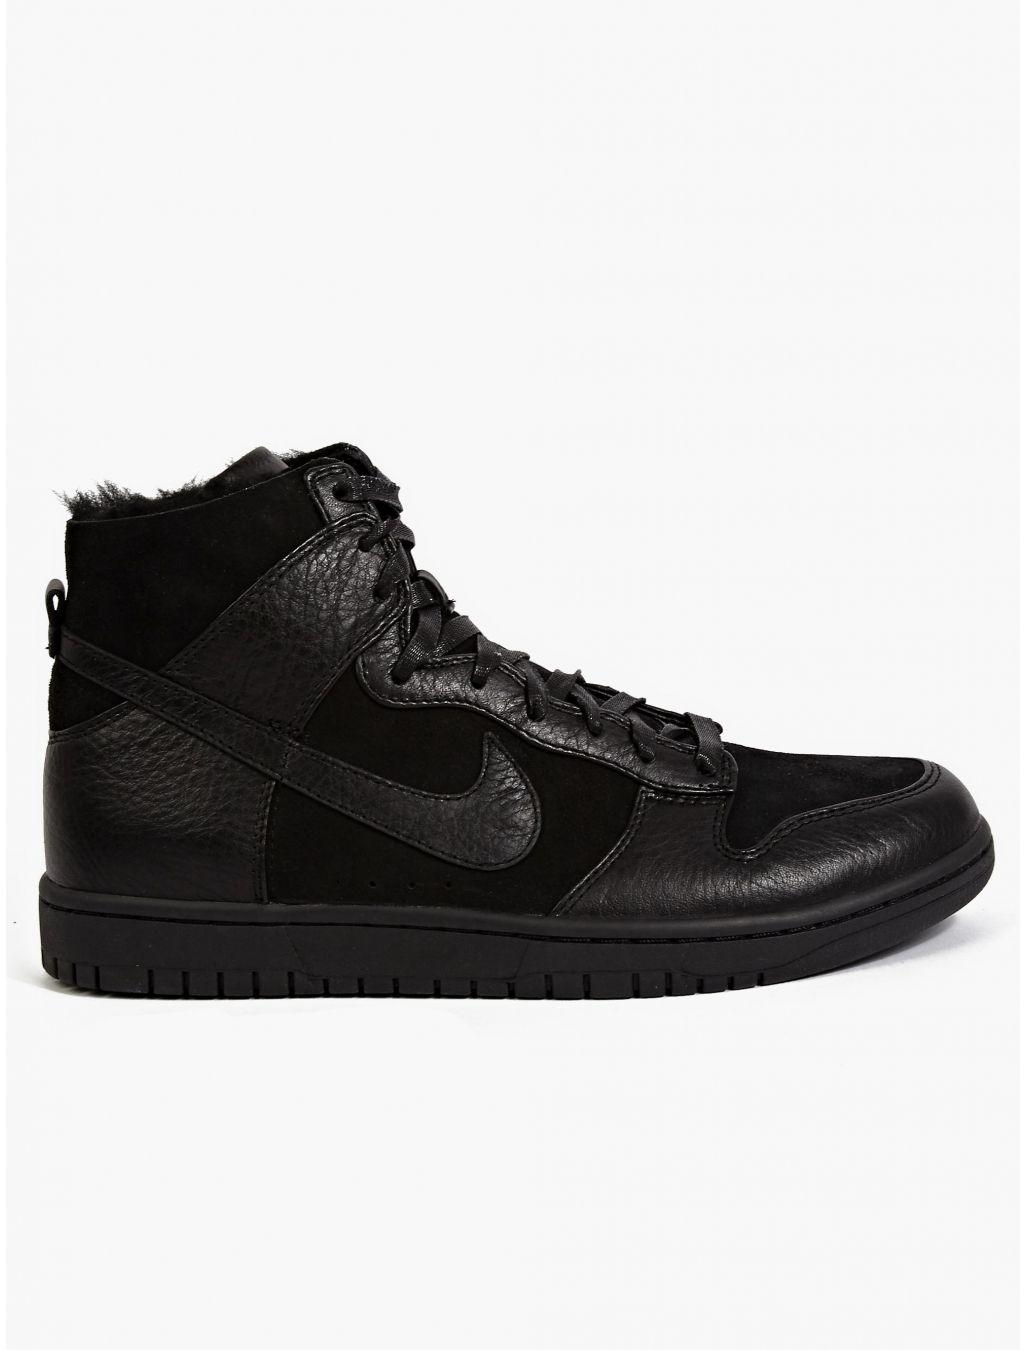 half off e2fa3 b2b6a NIKE Mens Black Dunk Lux SP Sherpa Hi-Top Sneakers  oki-ni